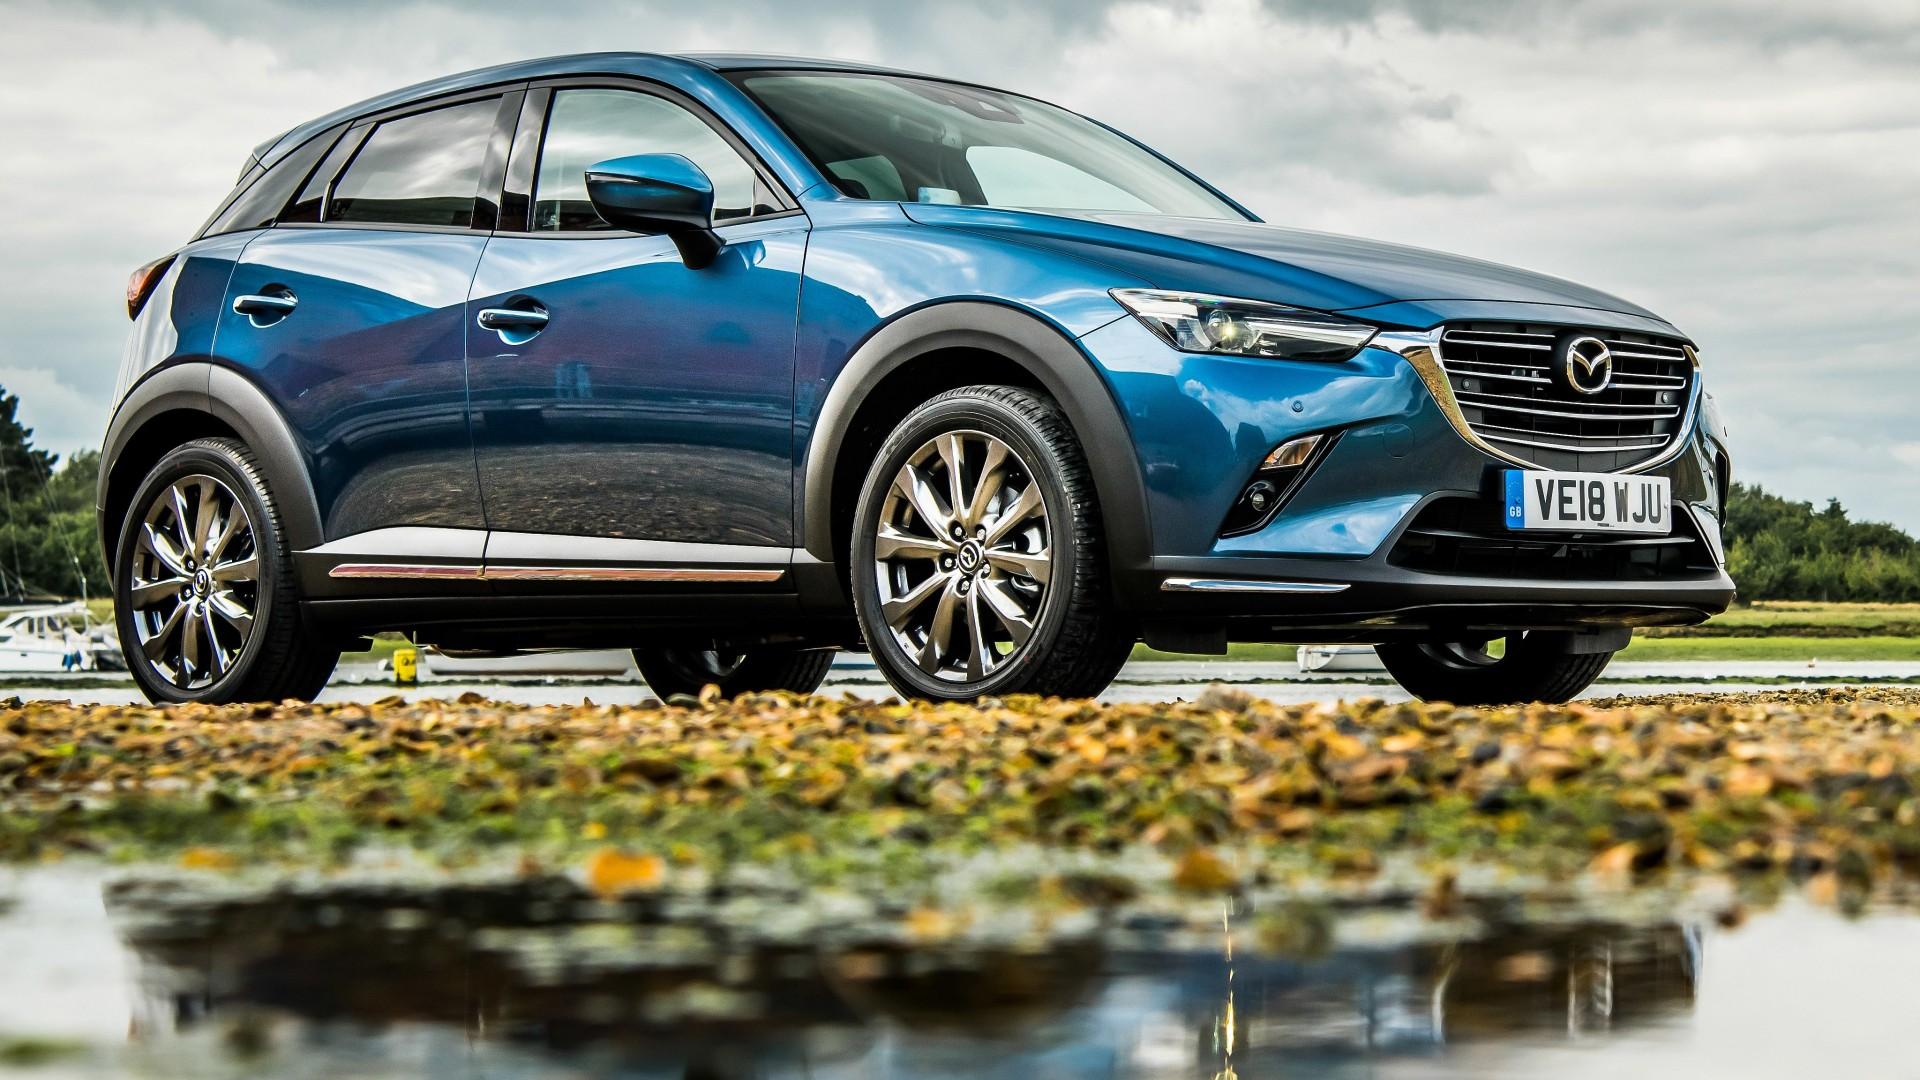 Wallpaper Mazda CX-3, 2019 Cars, SUV, crossover, 4K, Cars ...